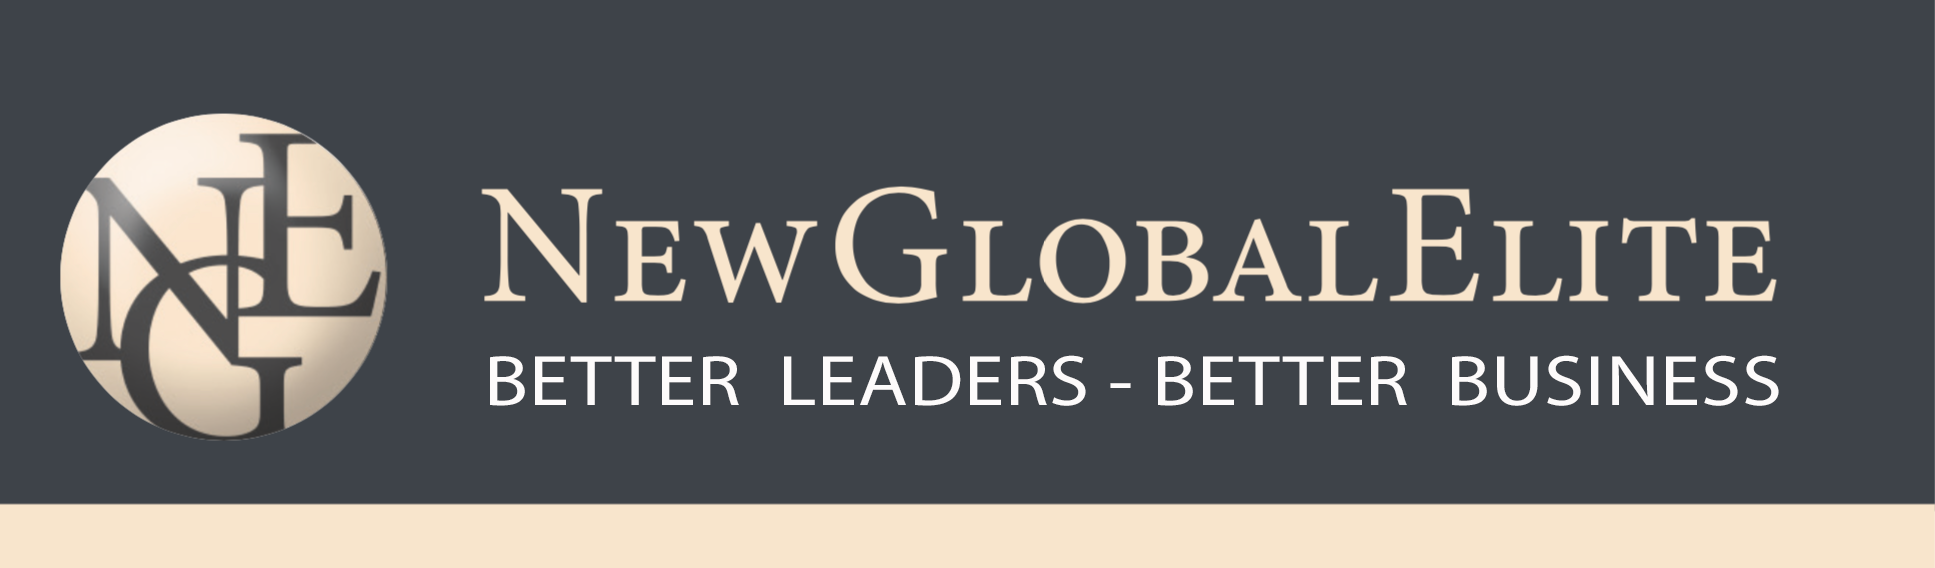 NGE-Logo-2018-1